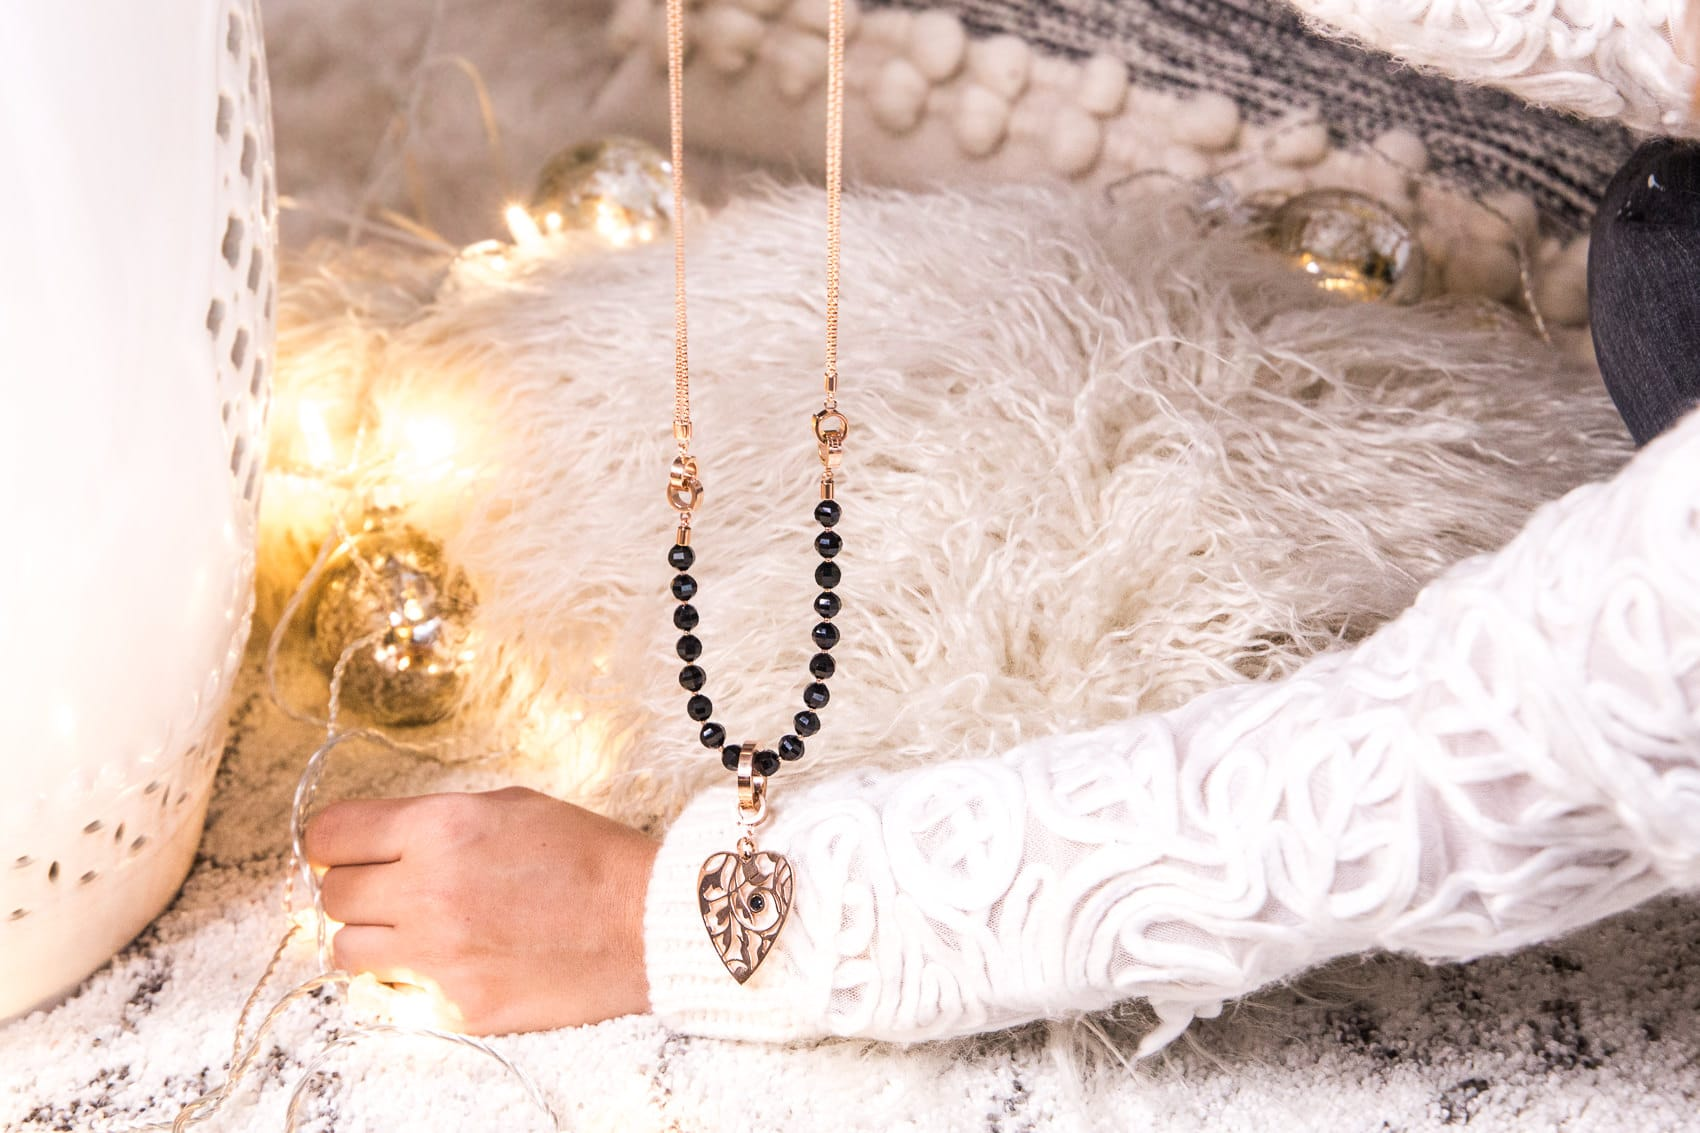 Des Belles Choses Adventskalender Türchen 4: Leonardo Schmuckstück